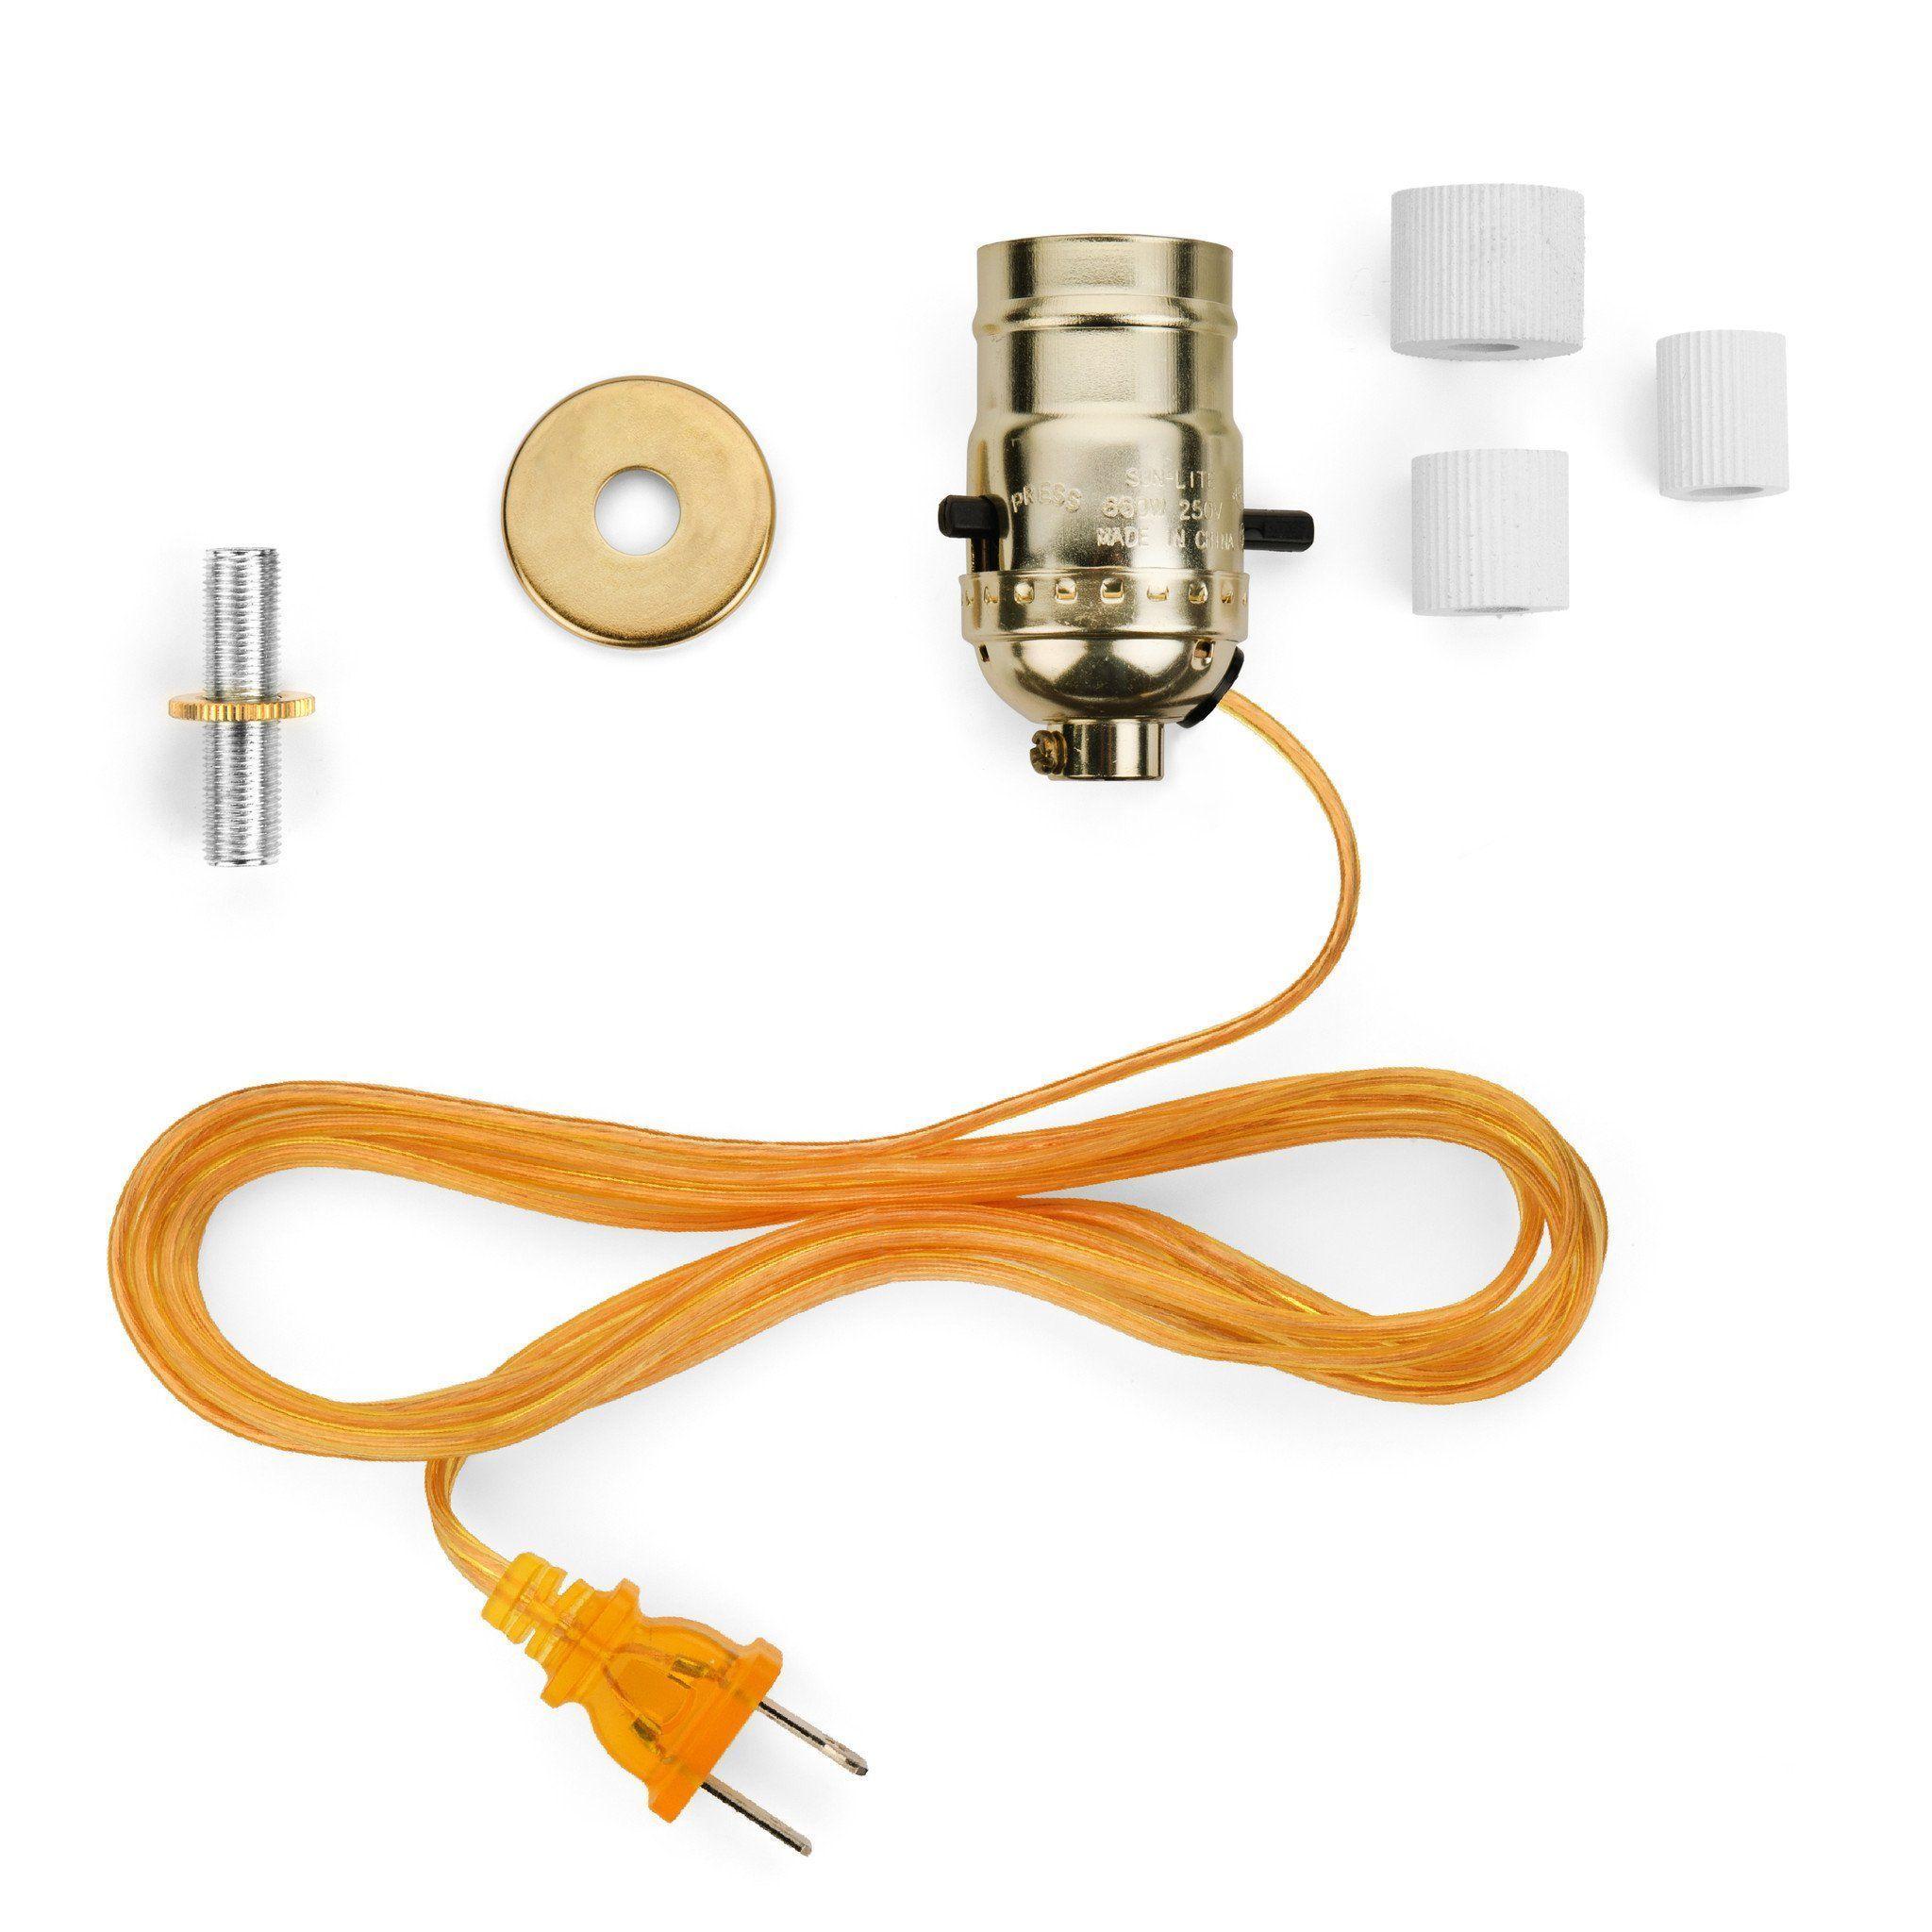 DARICE 8/' CORD LAMP SOCKET KIT NEW DIY Fix a Lamp